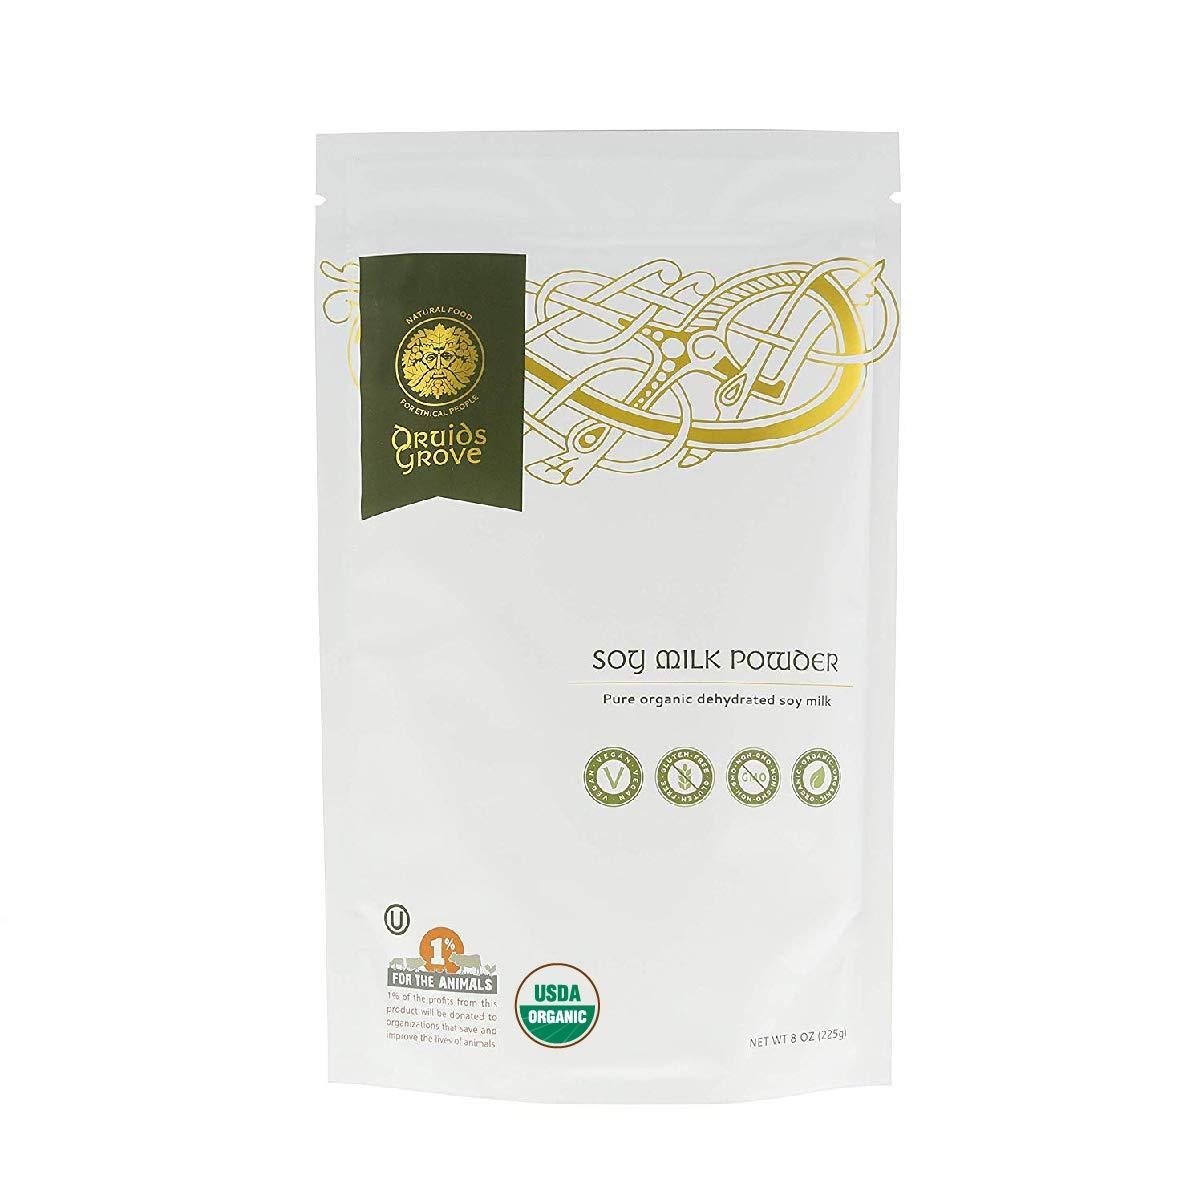 Druids Grove Soy Milk Powder ☮ Vegan ⊘ Non-GMO ❤ Gluten-Free ✡ OU Kosher Certified - 8 oz.